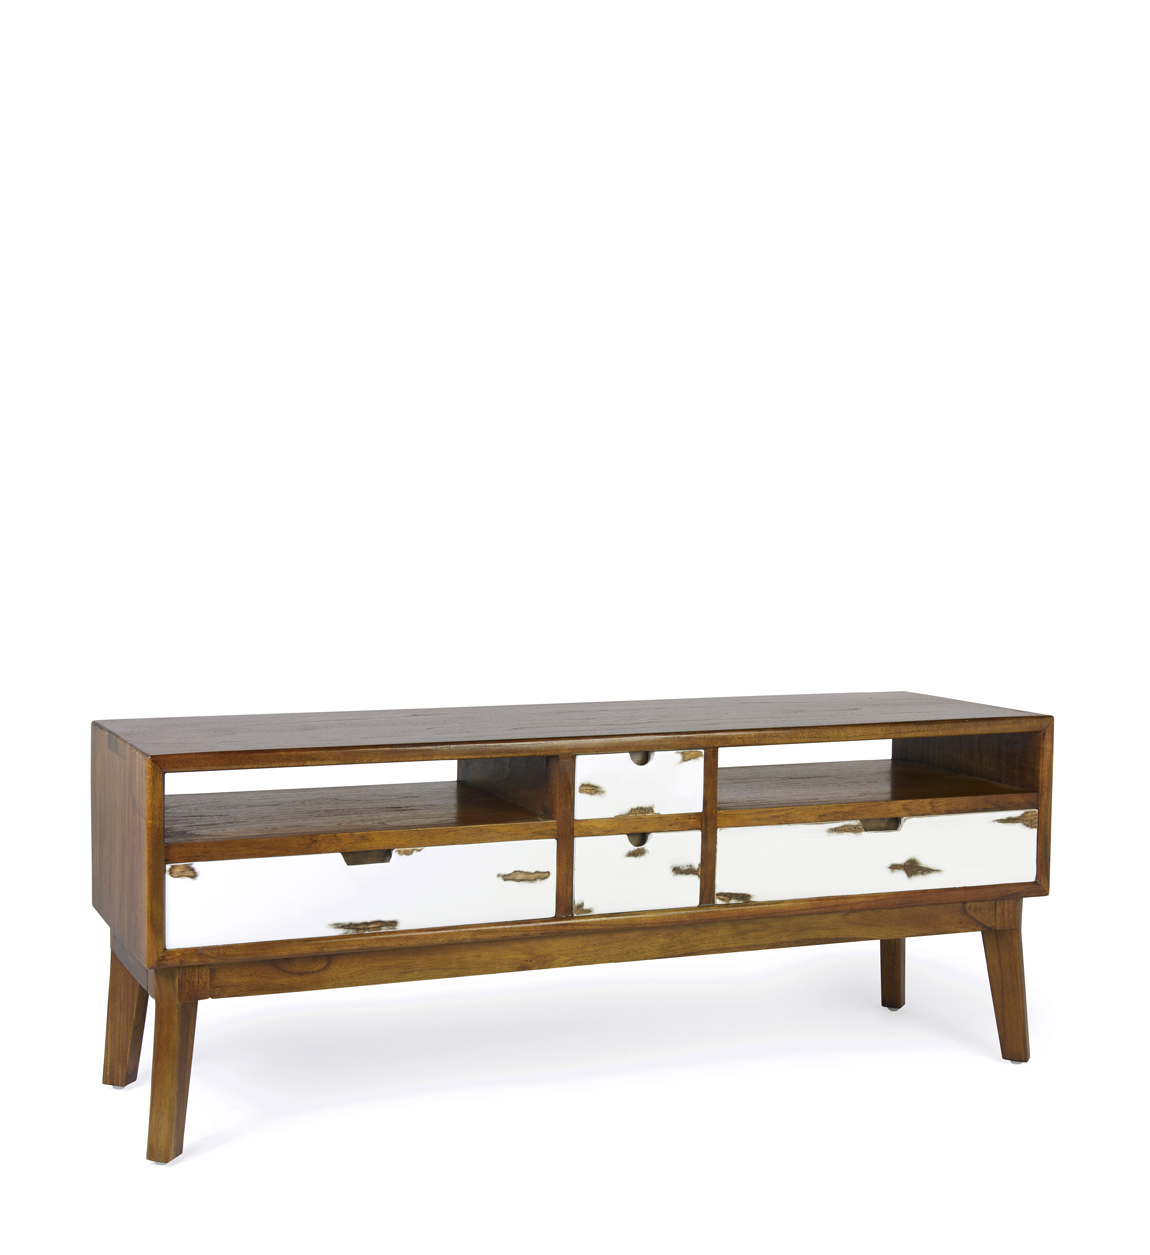 Meuble TV en bois marron et tiroirs blancs